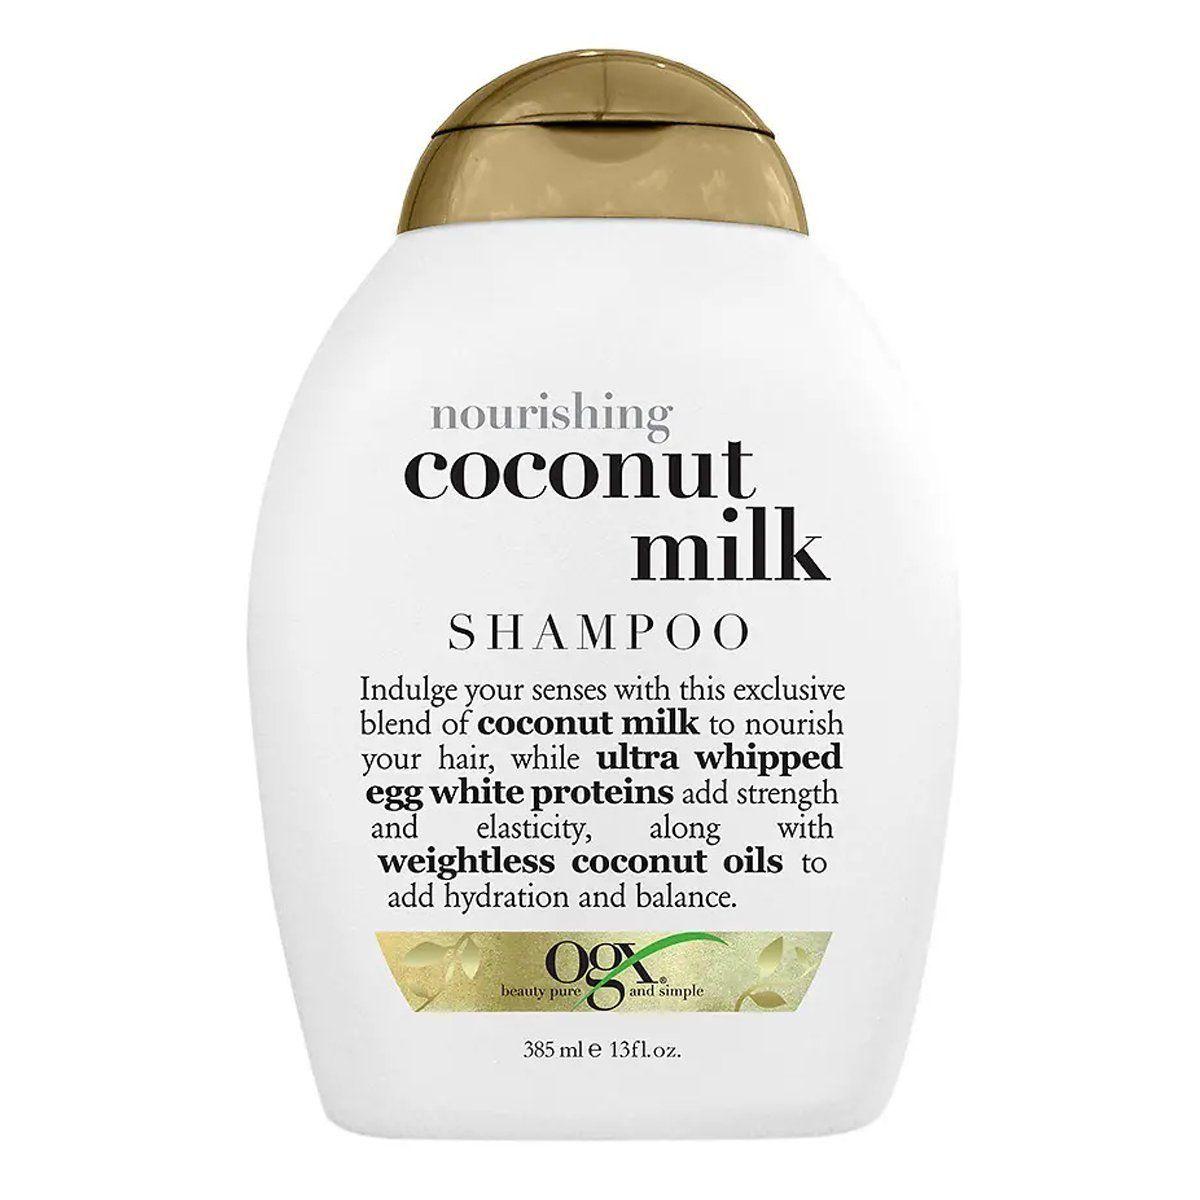 OGX Nourishing Coconut Milk Shampoo 13oz Coconut milk